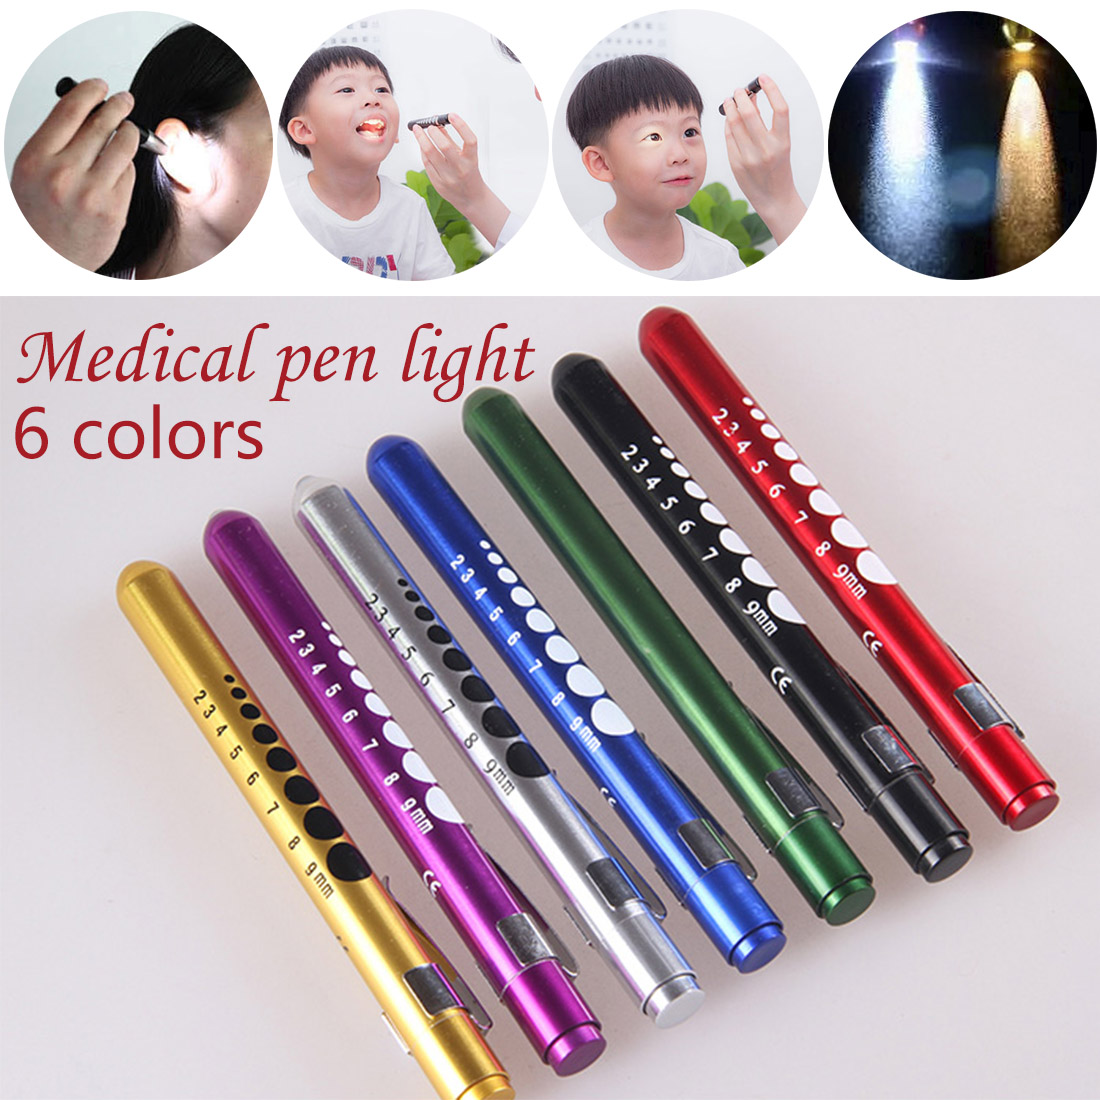 Work Light Beam Penlight Pen Light Pocket Torch Reusable Emergency Yellow Beam Medical Doctor Nurse Pen Light